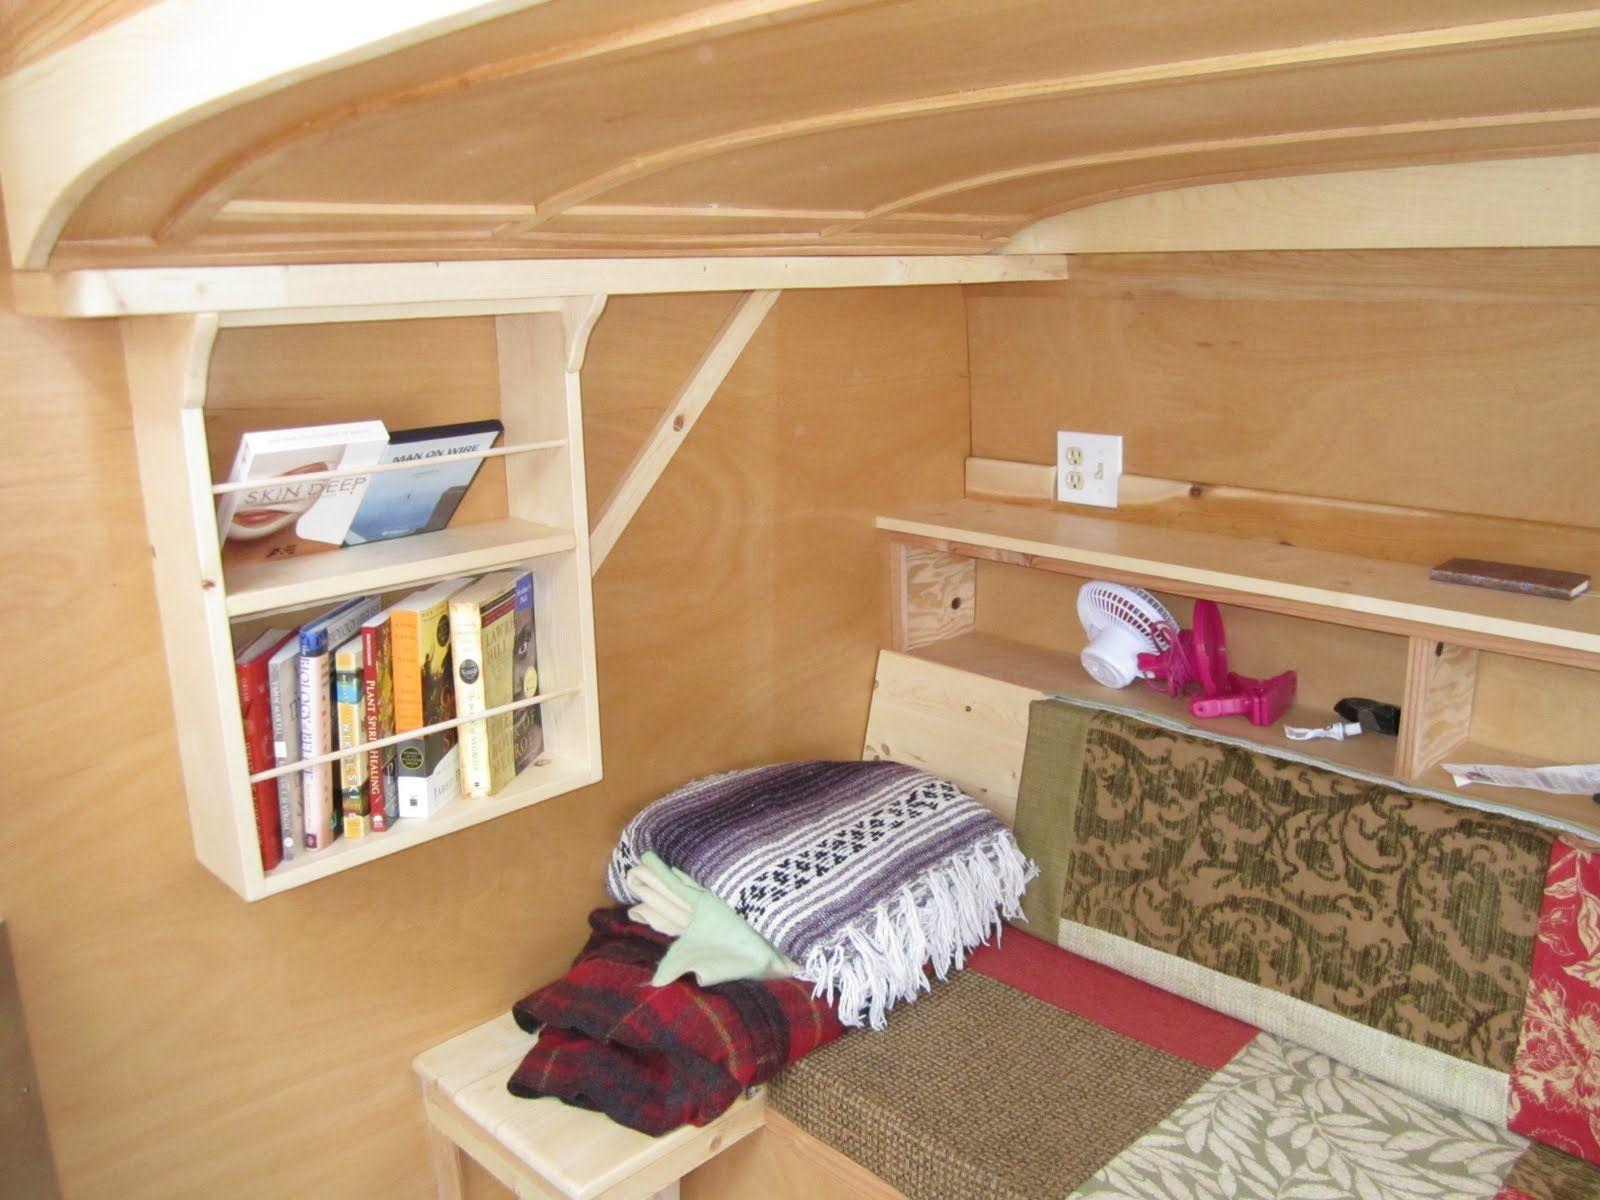 Tiny Home Teardrop Trailer camping trailers Pinterest Teardrop